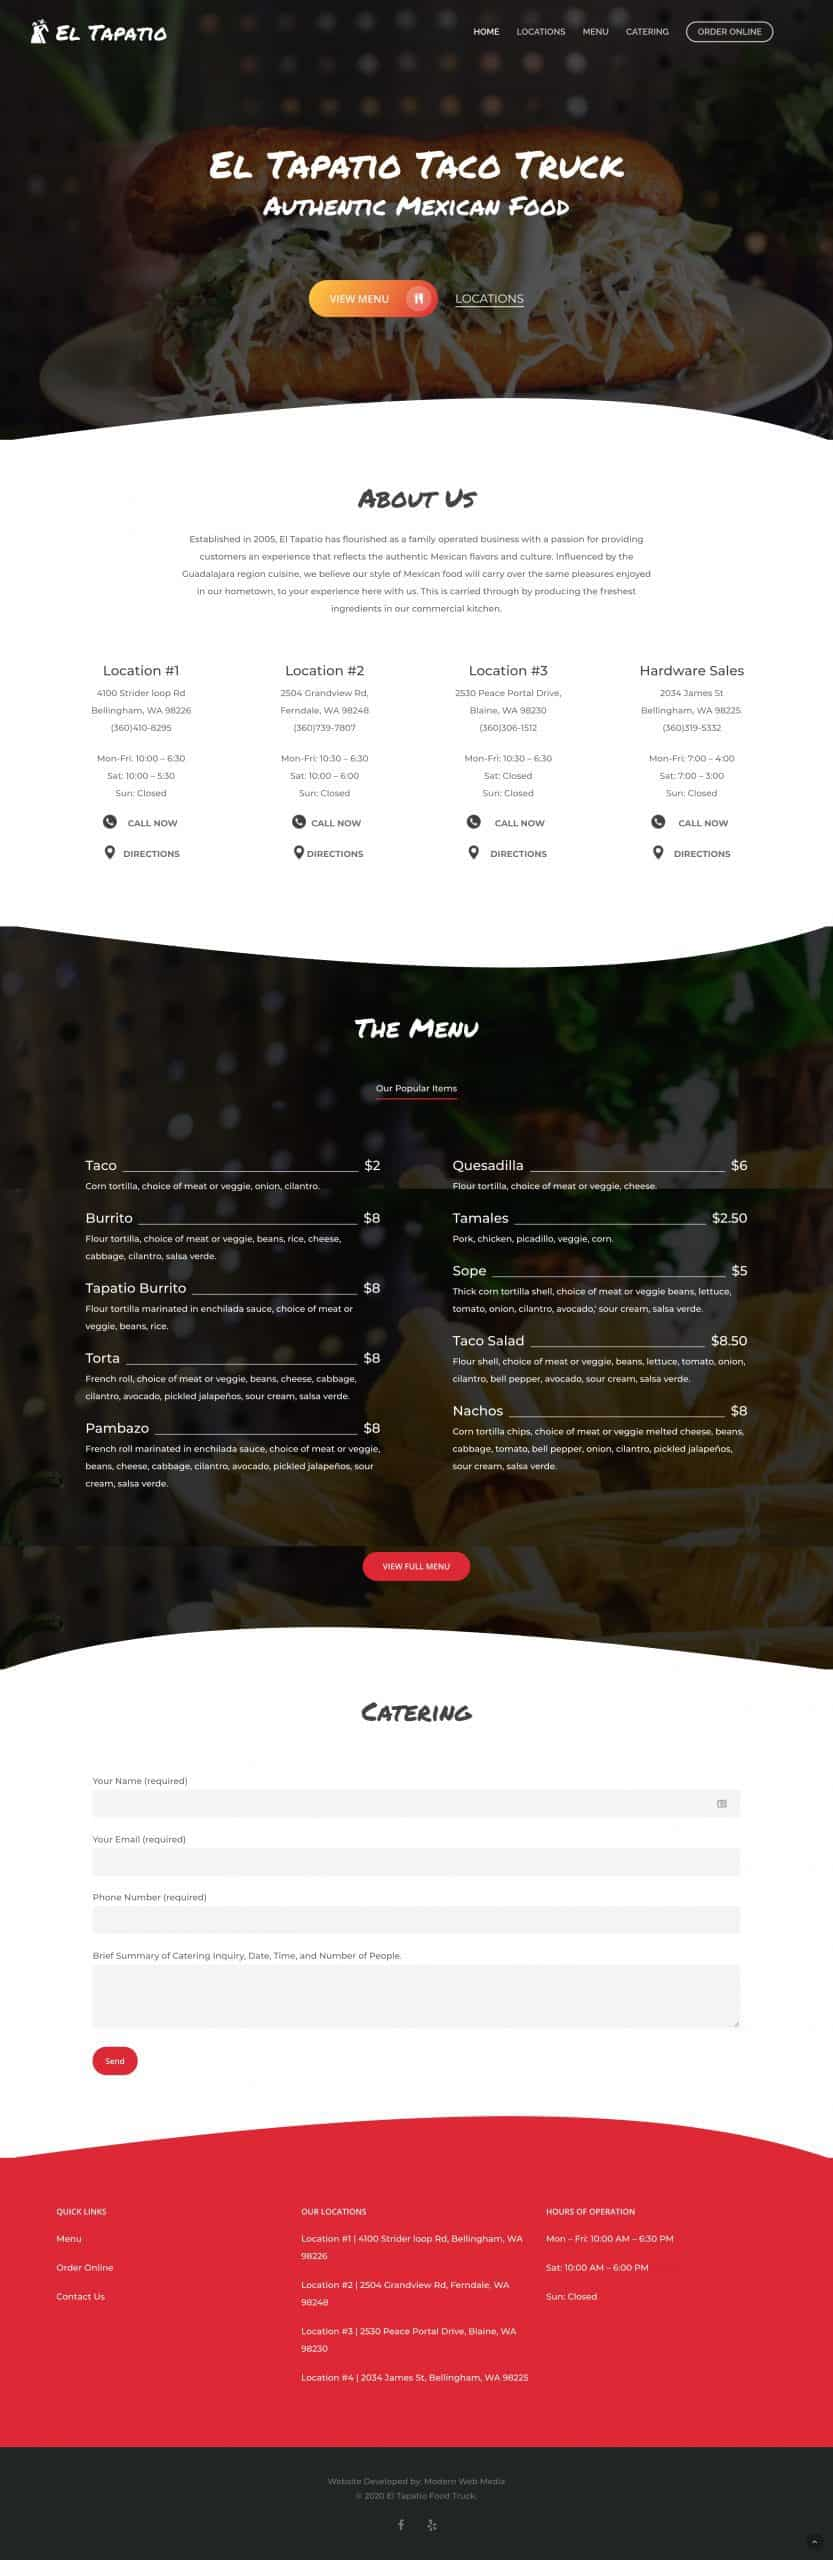 El Tapatio Full Website Screenshot